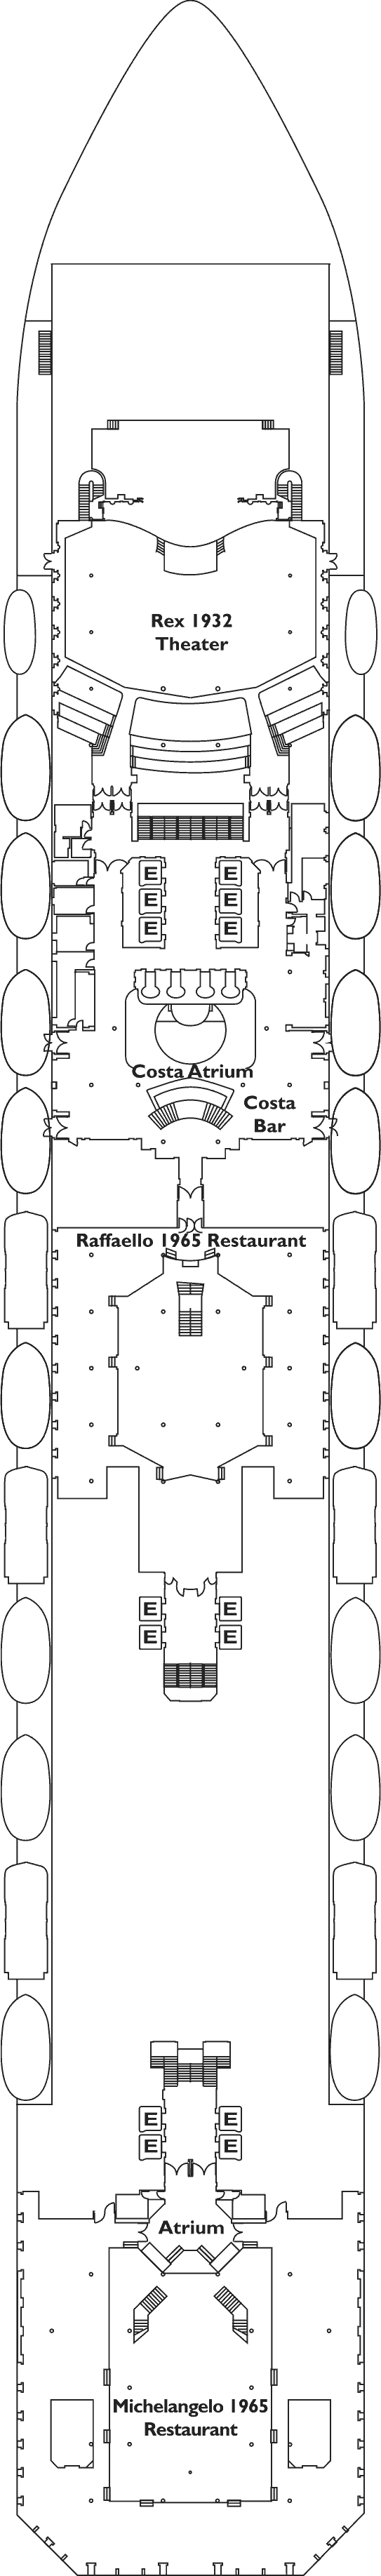 Costa Fortuna BUENOS AIRES